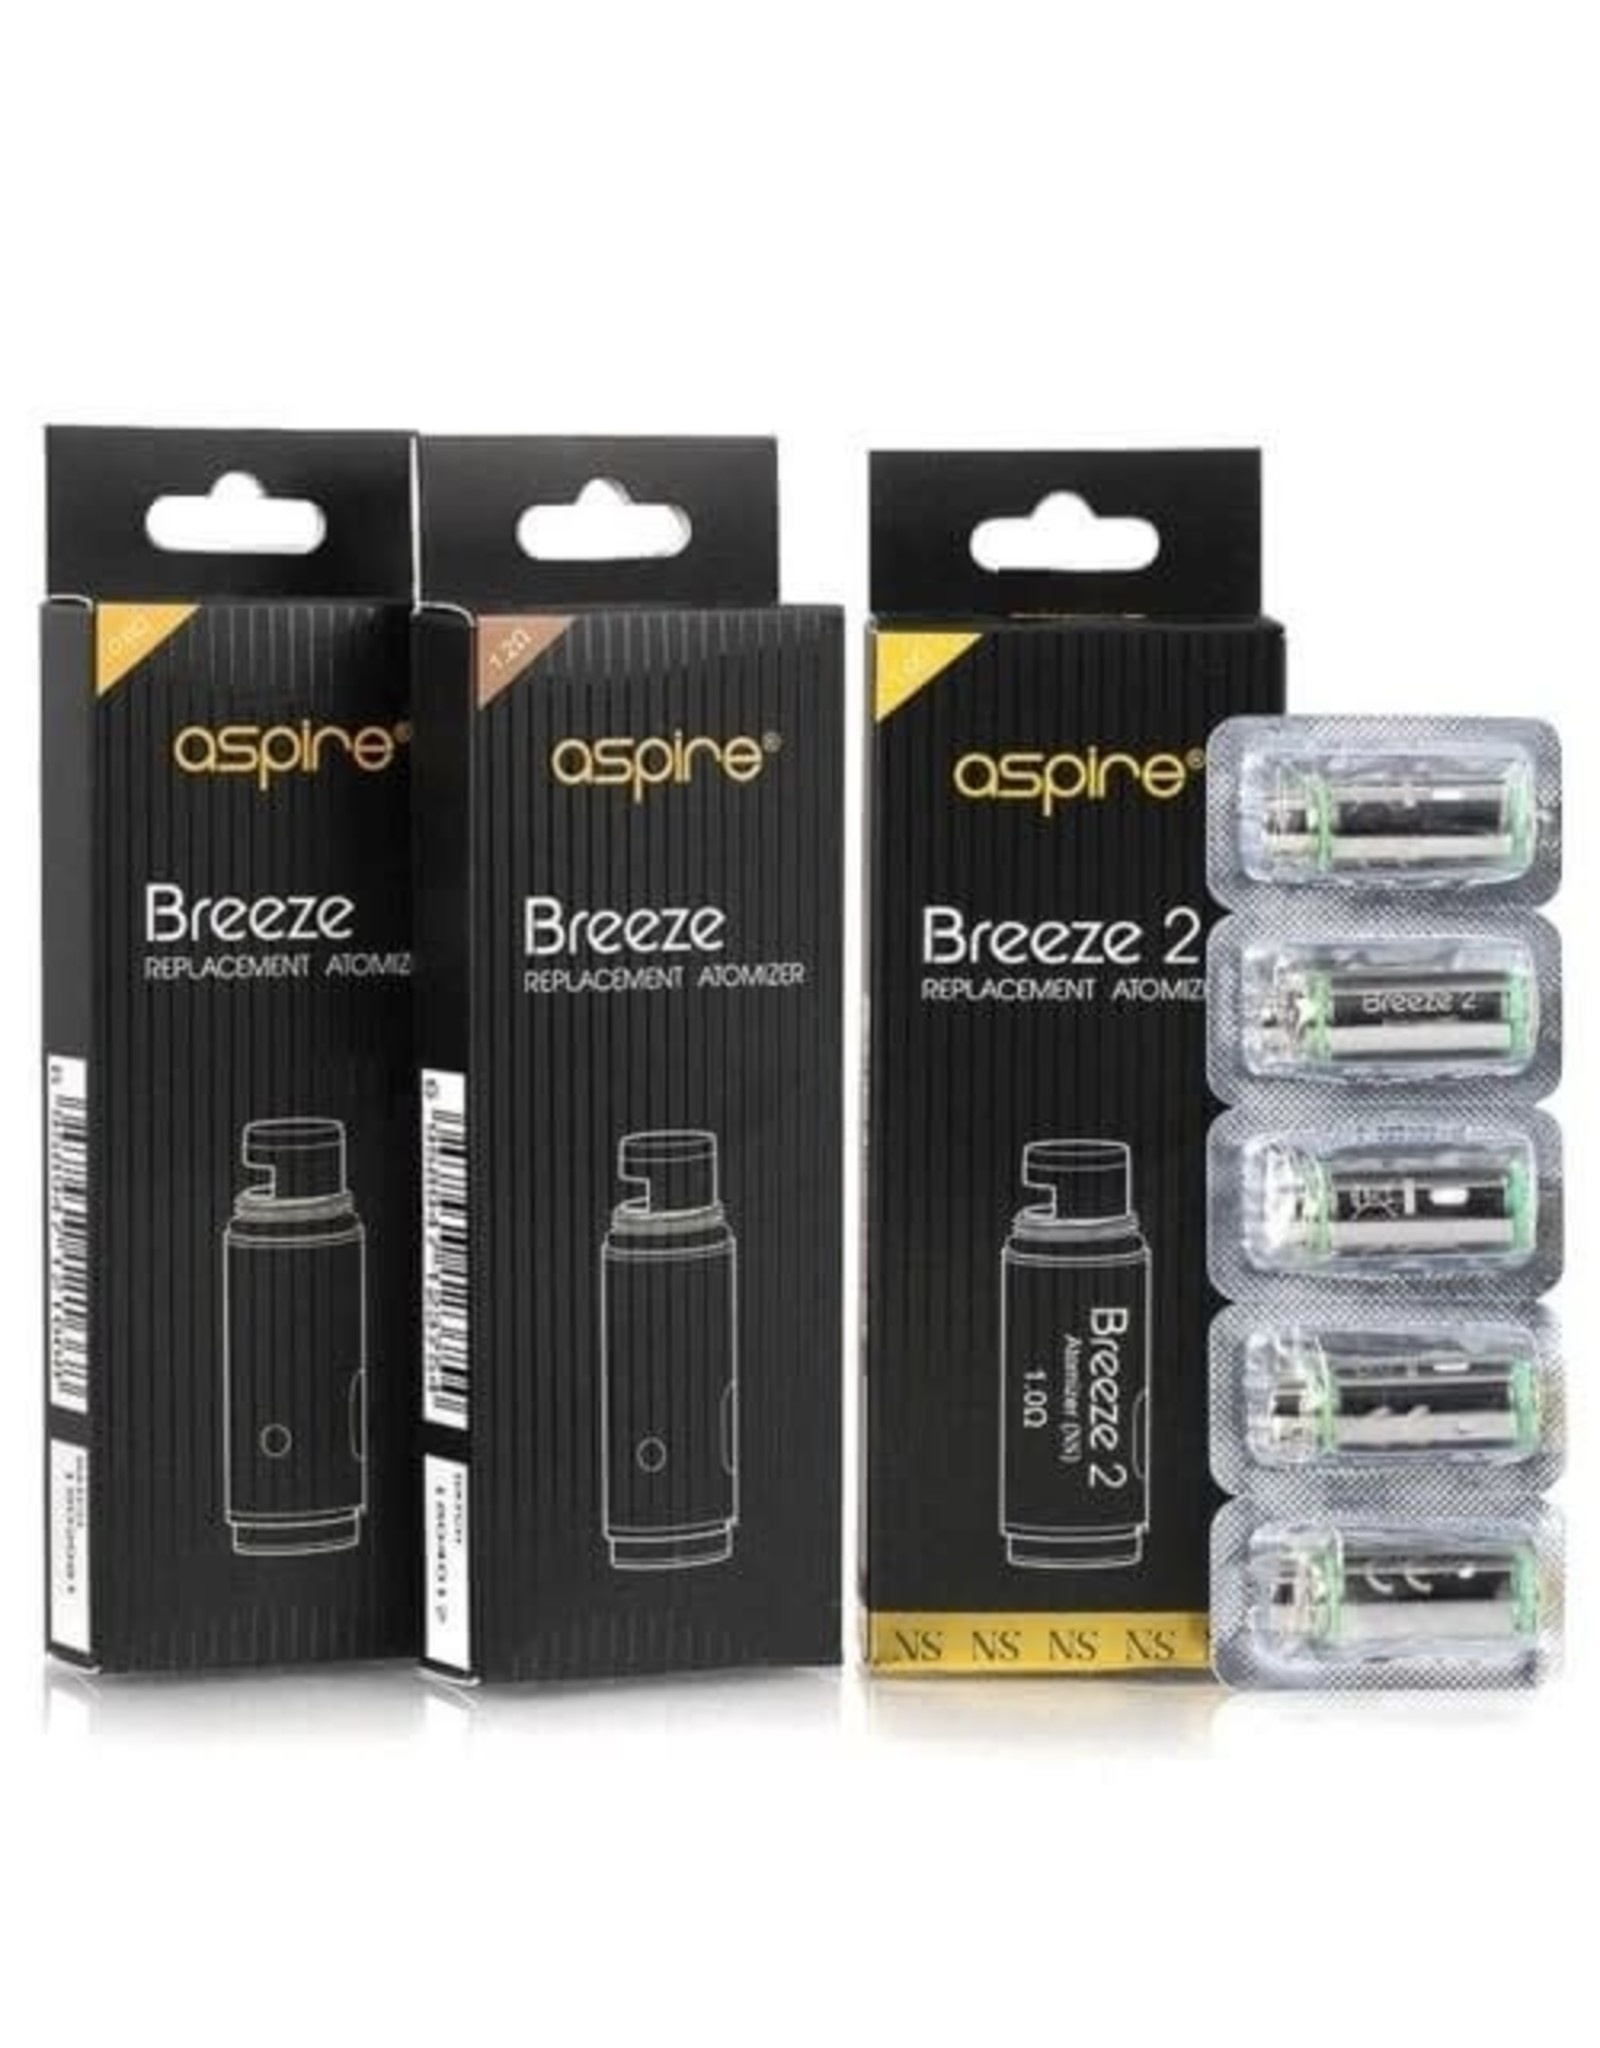 Aspire Aspire Breeze Coil Single